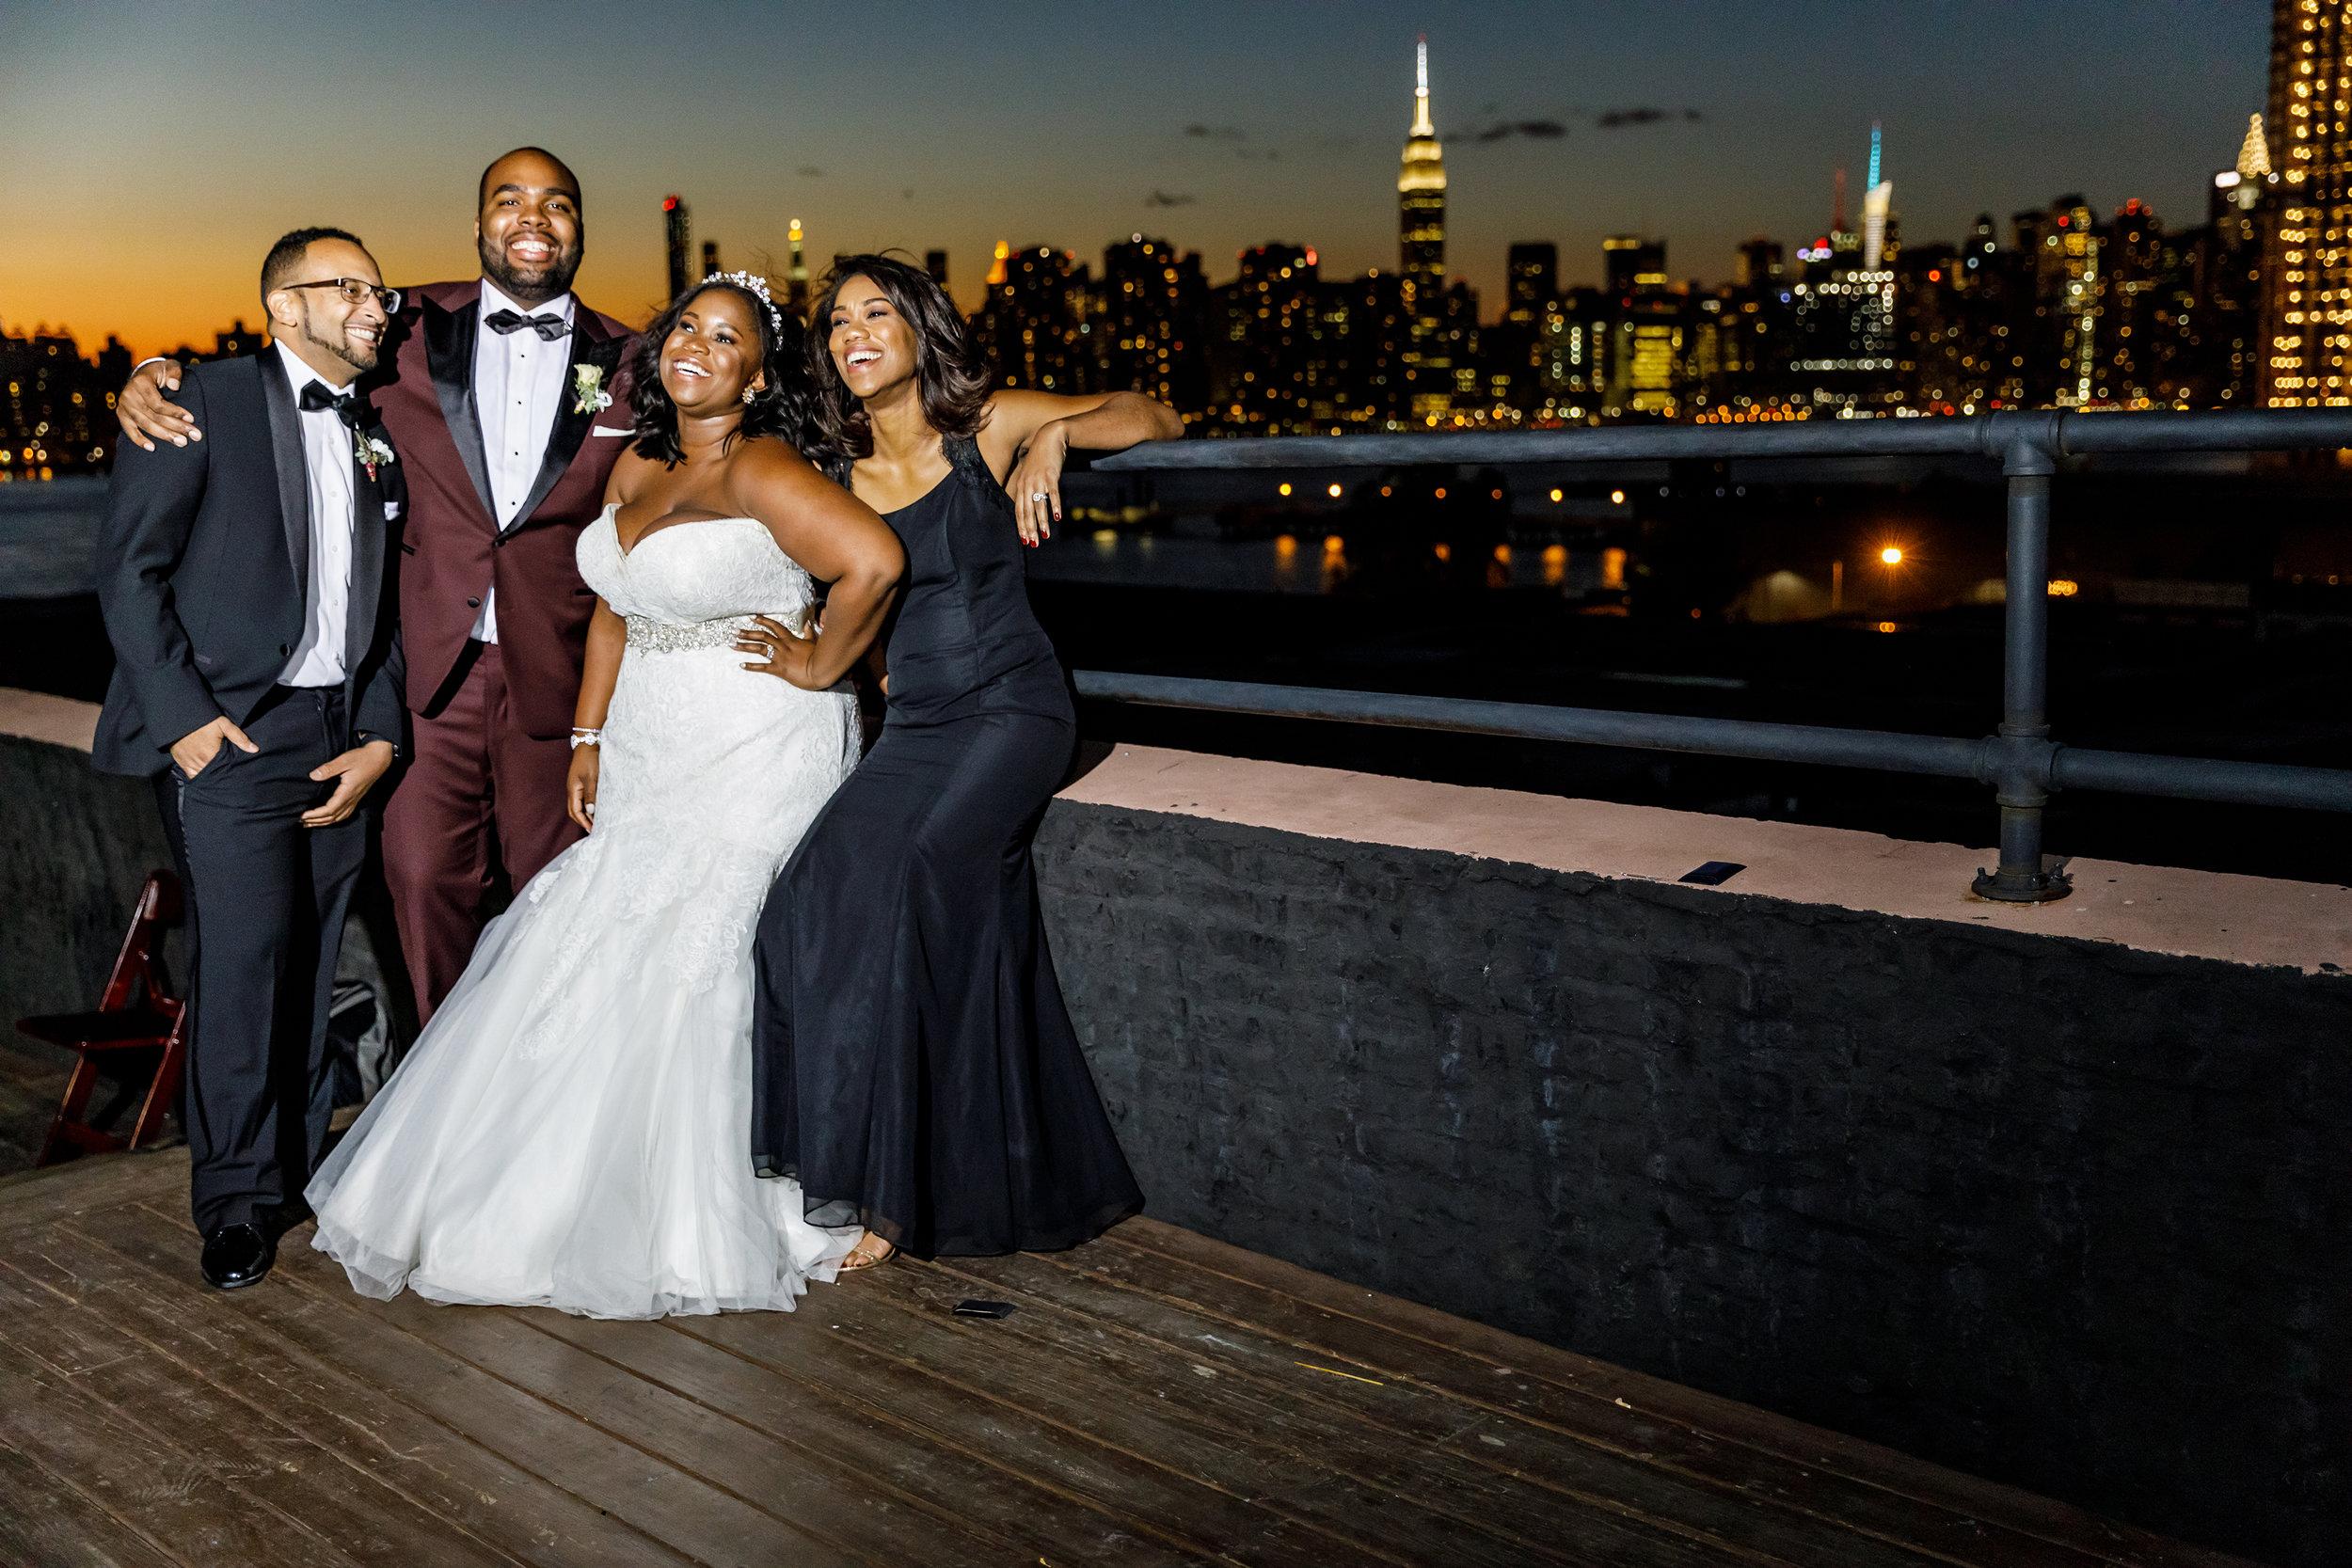 victorious-events-nyc-035-yanique-rondel-greenpoint-loft-wedding-amy-anaiz.jpg